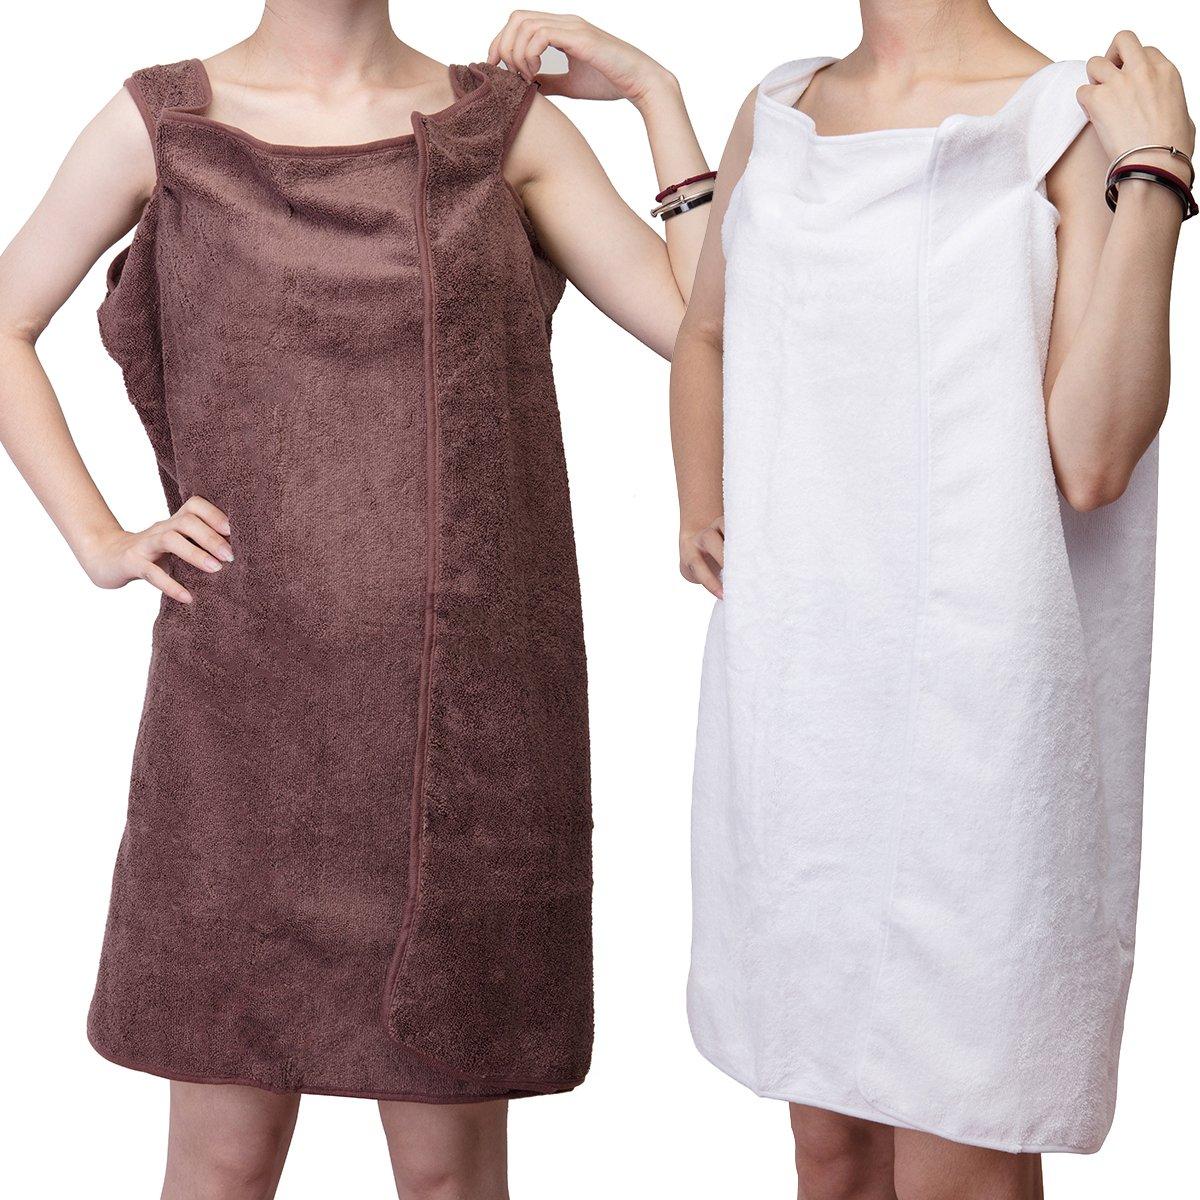 DODOING 2 Pack Microfiber Fabric Women Bath Towel Wearable Beach Towel Soft Spa BathRobe Beach Wrap Skirt Super Absorbent Bath Gown 150x80cm